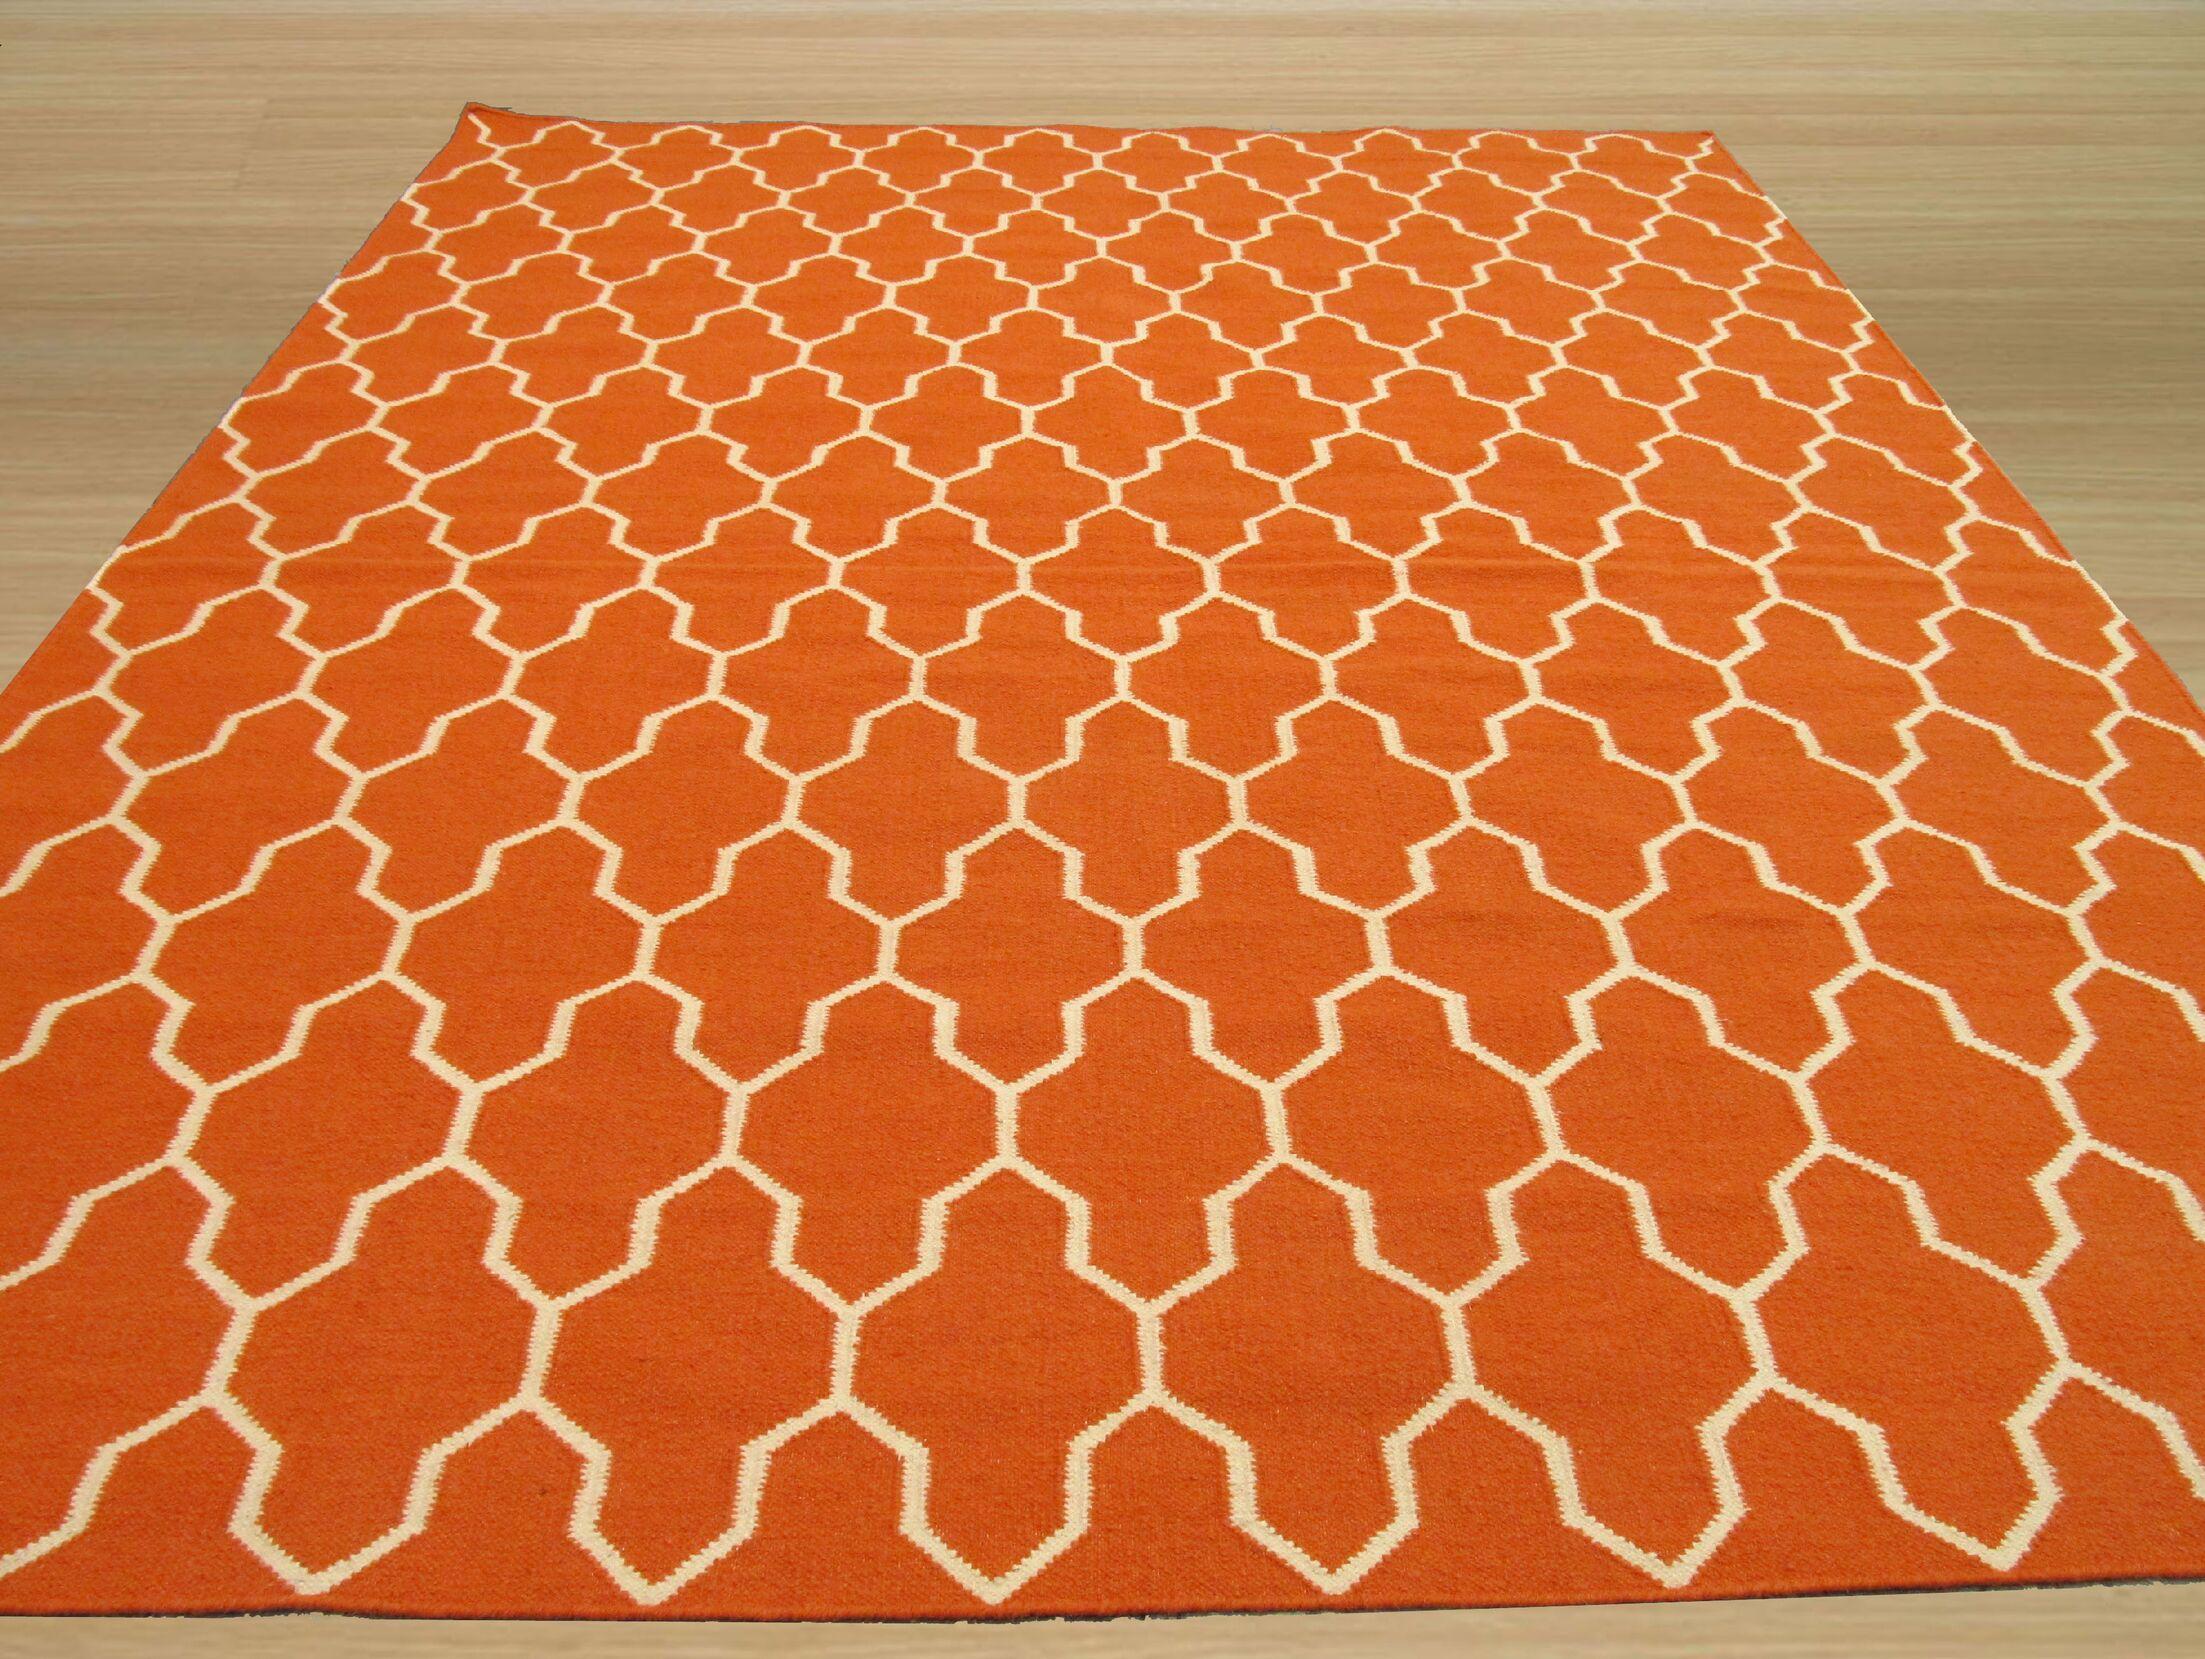 Hand-Woven Orange/Ivory Wool Area Rug Rug Size: Rectangle 5'6